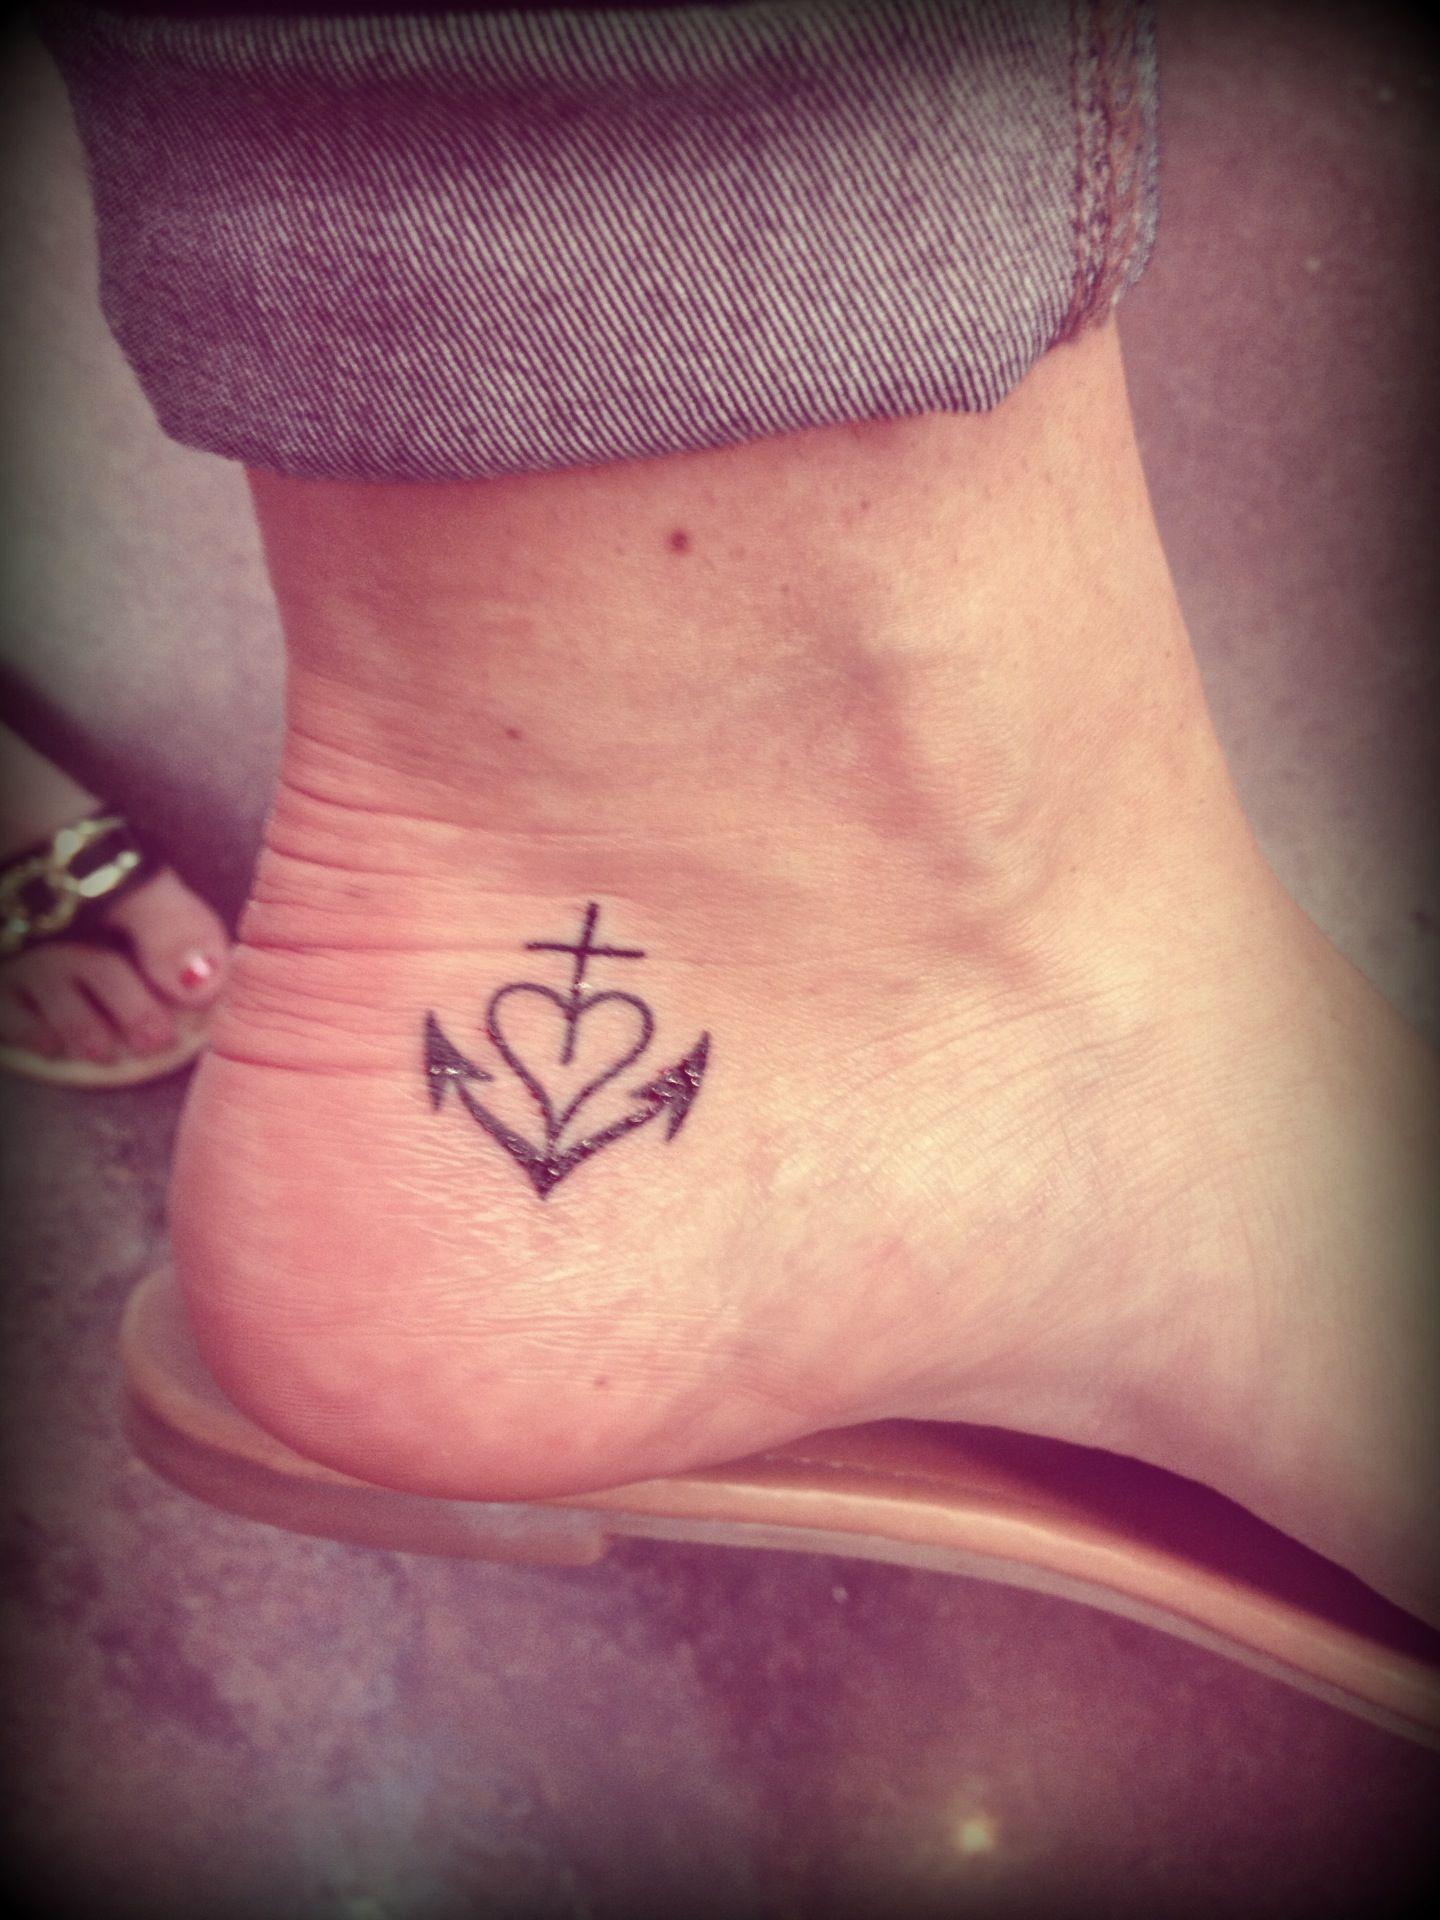 Camargue Cross Tattoo The Symbol Represents The Three Key